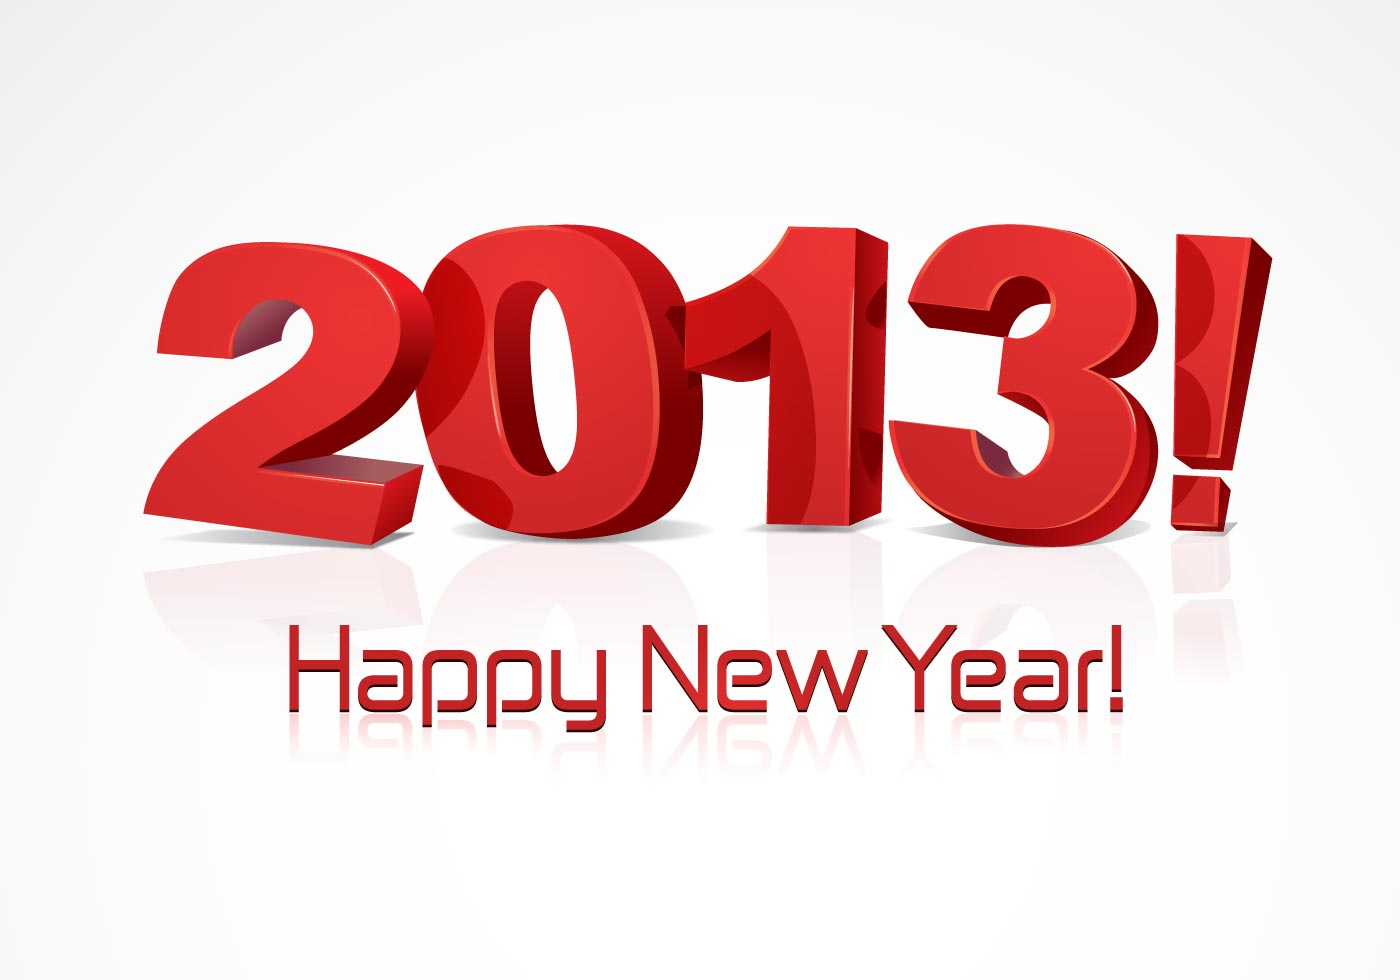 happy new year 2013 - photo #22